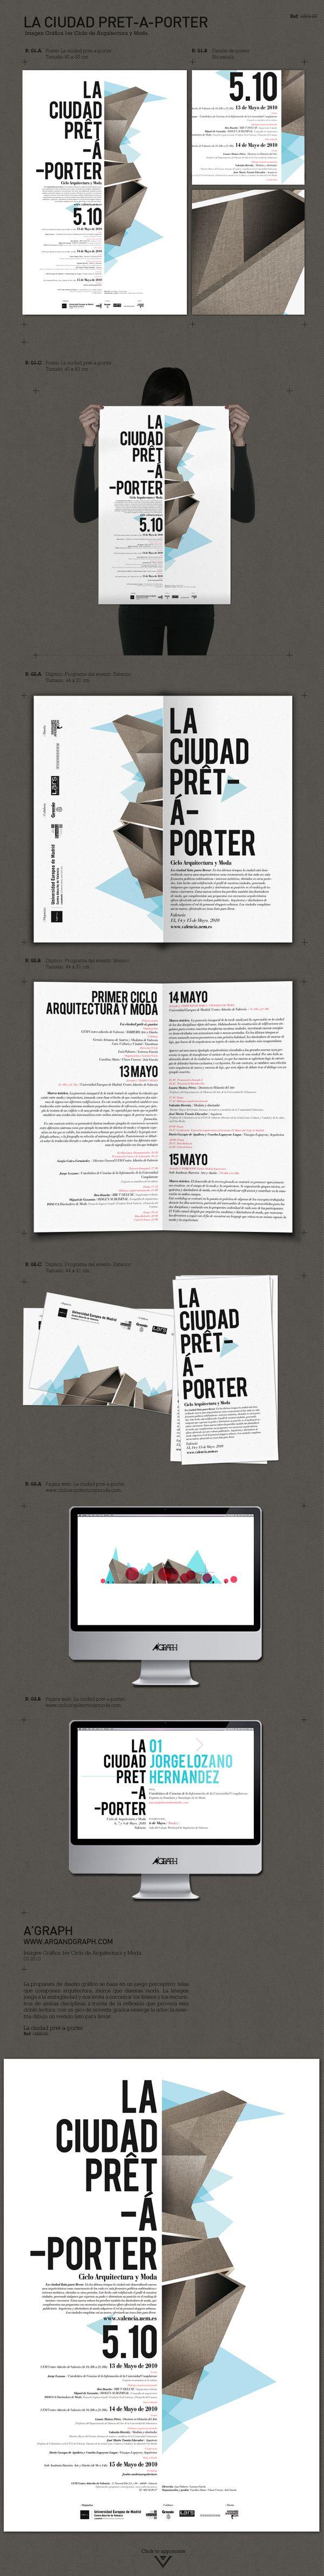 La Ciudad Pret A Porter On Branding Served Graphic Design Logo Grafic Design Graphic Design Typography